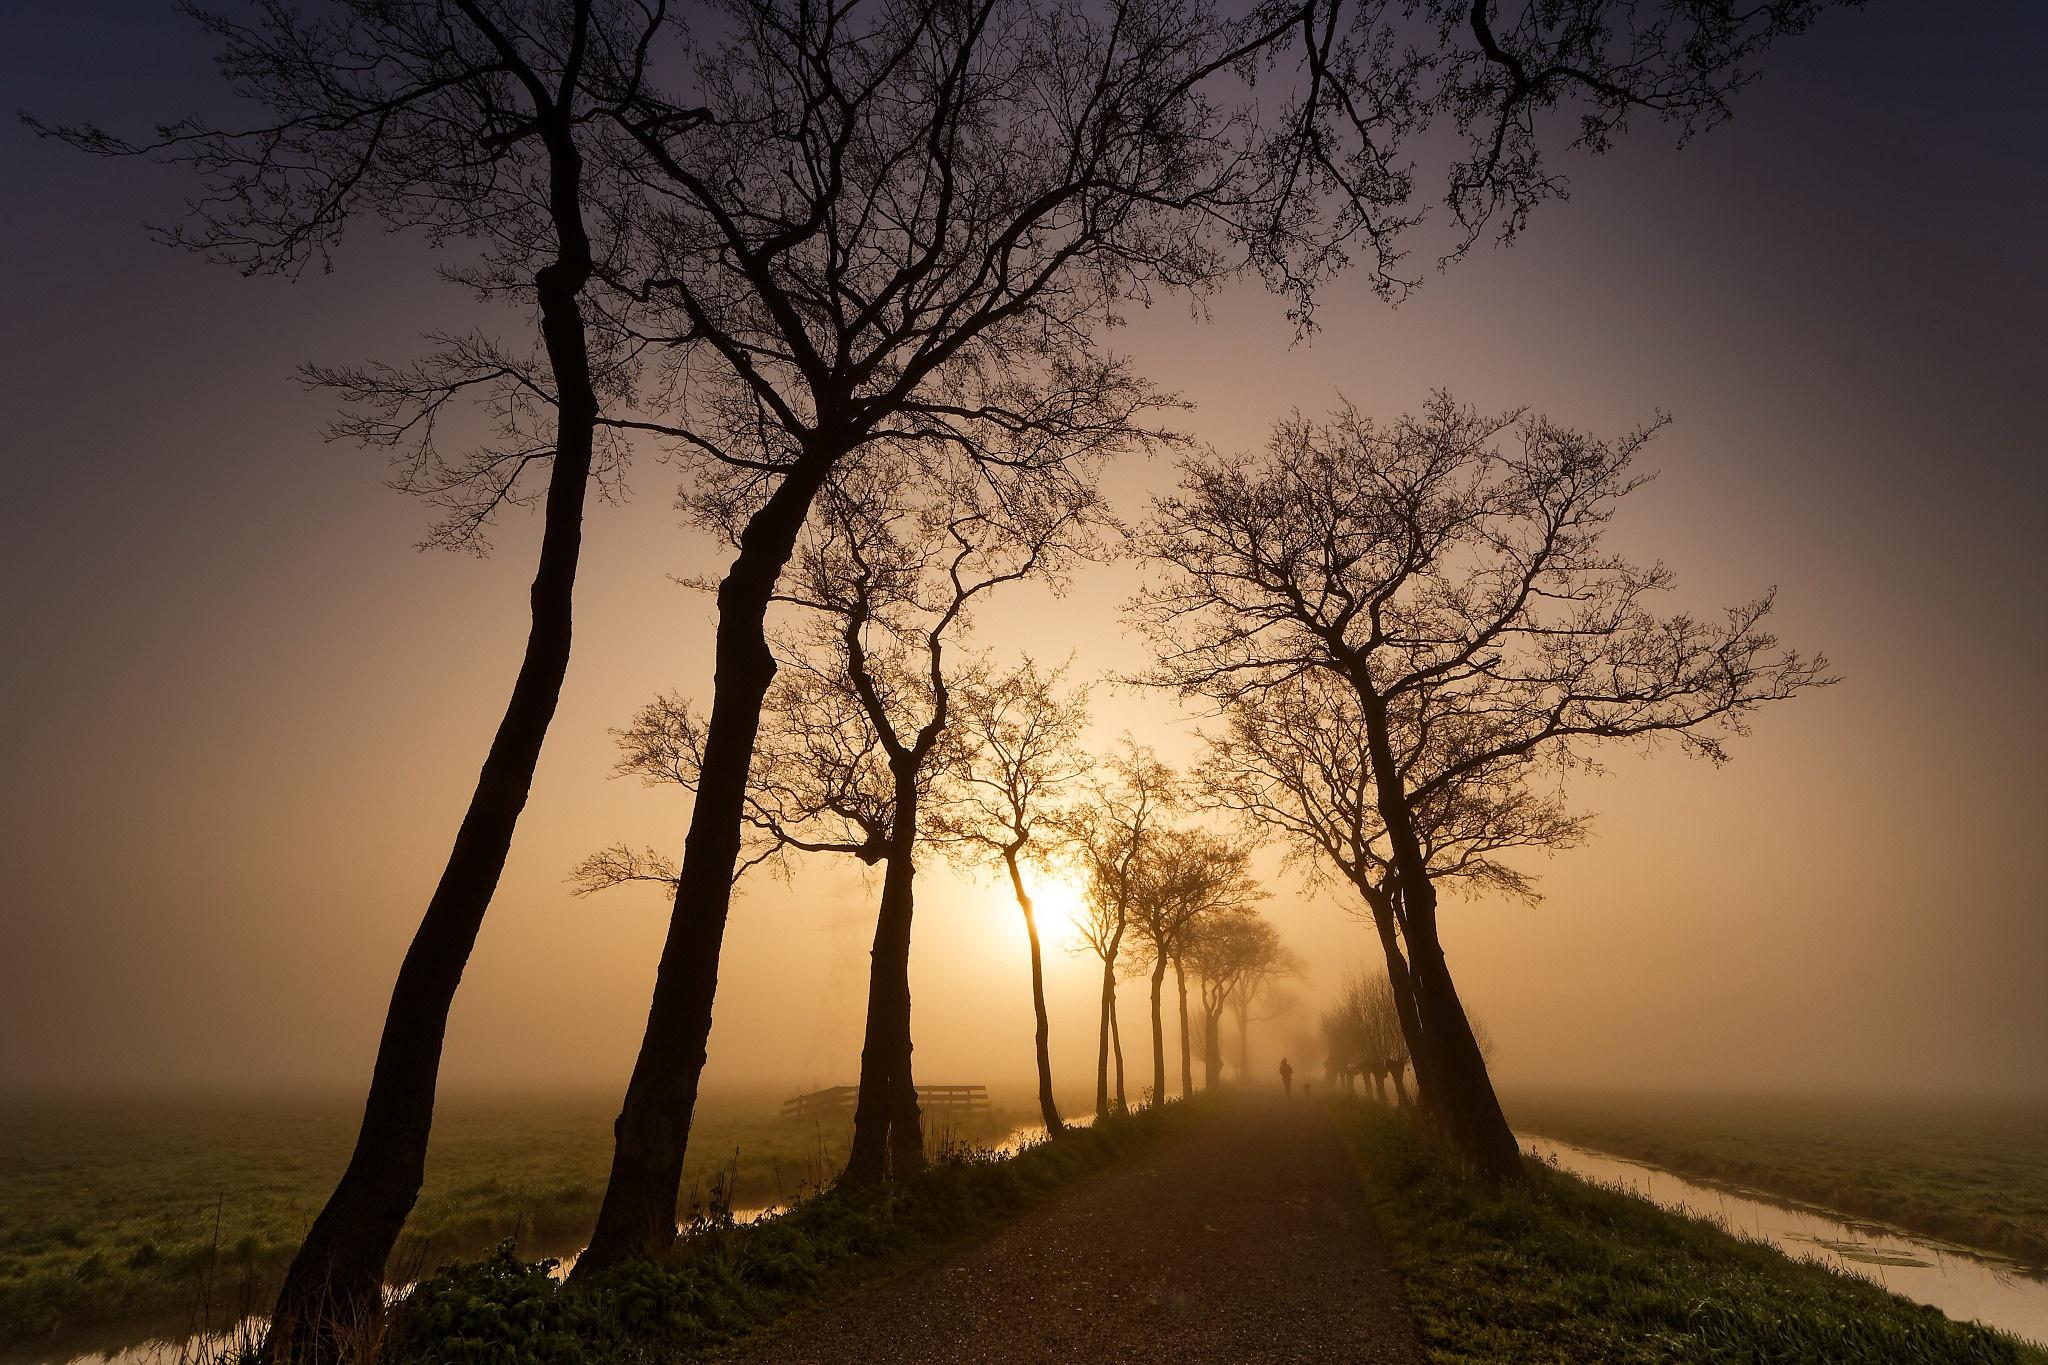 Nature Road Sunset 2048x1365